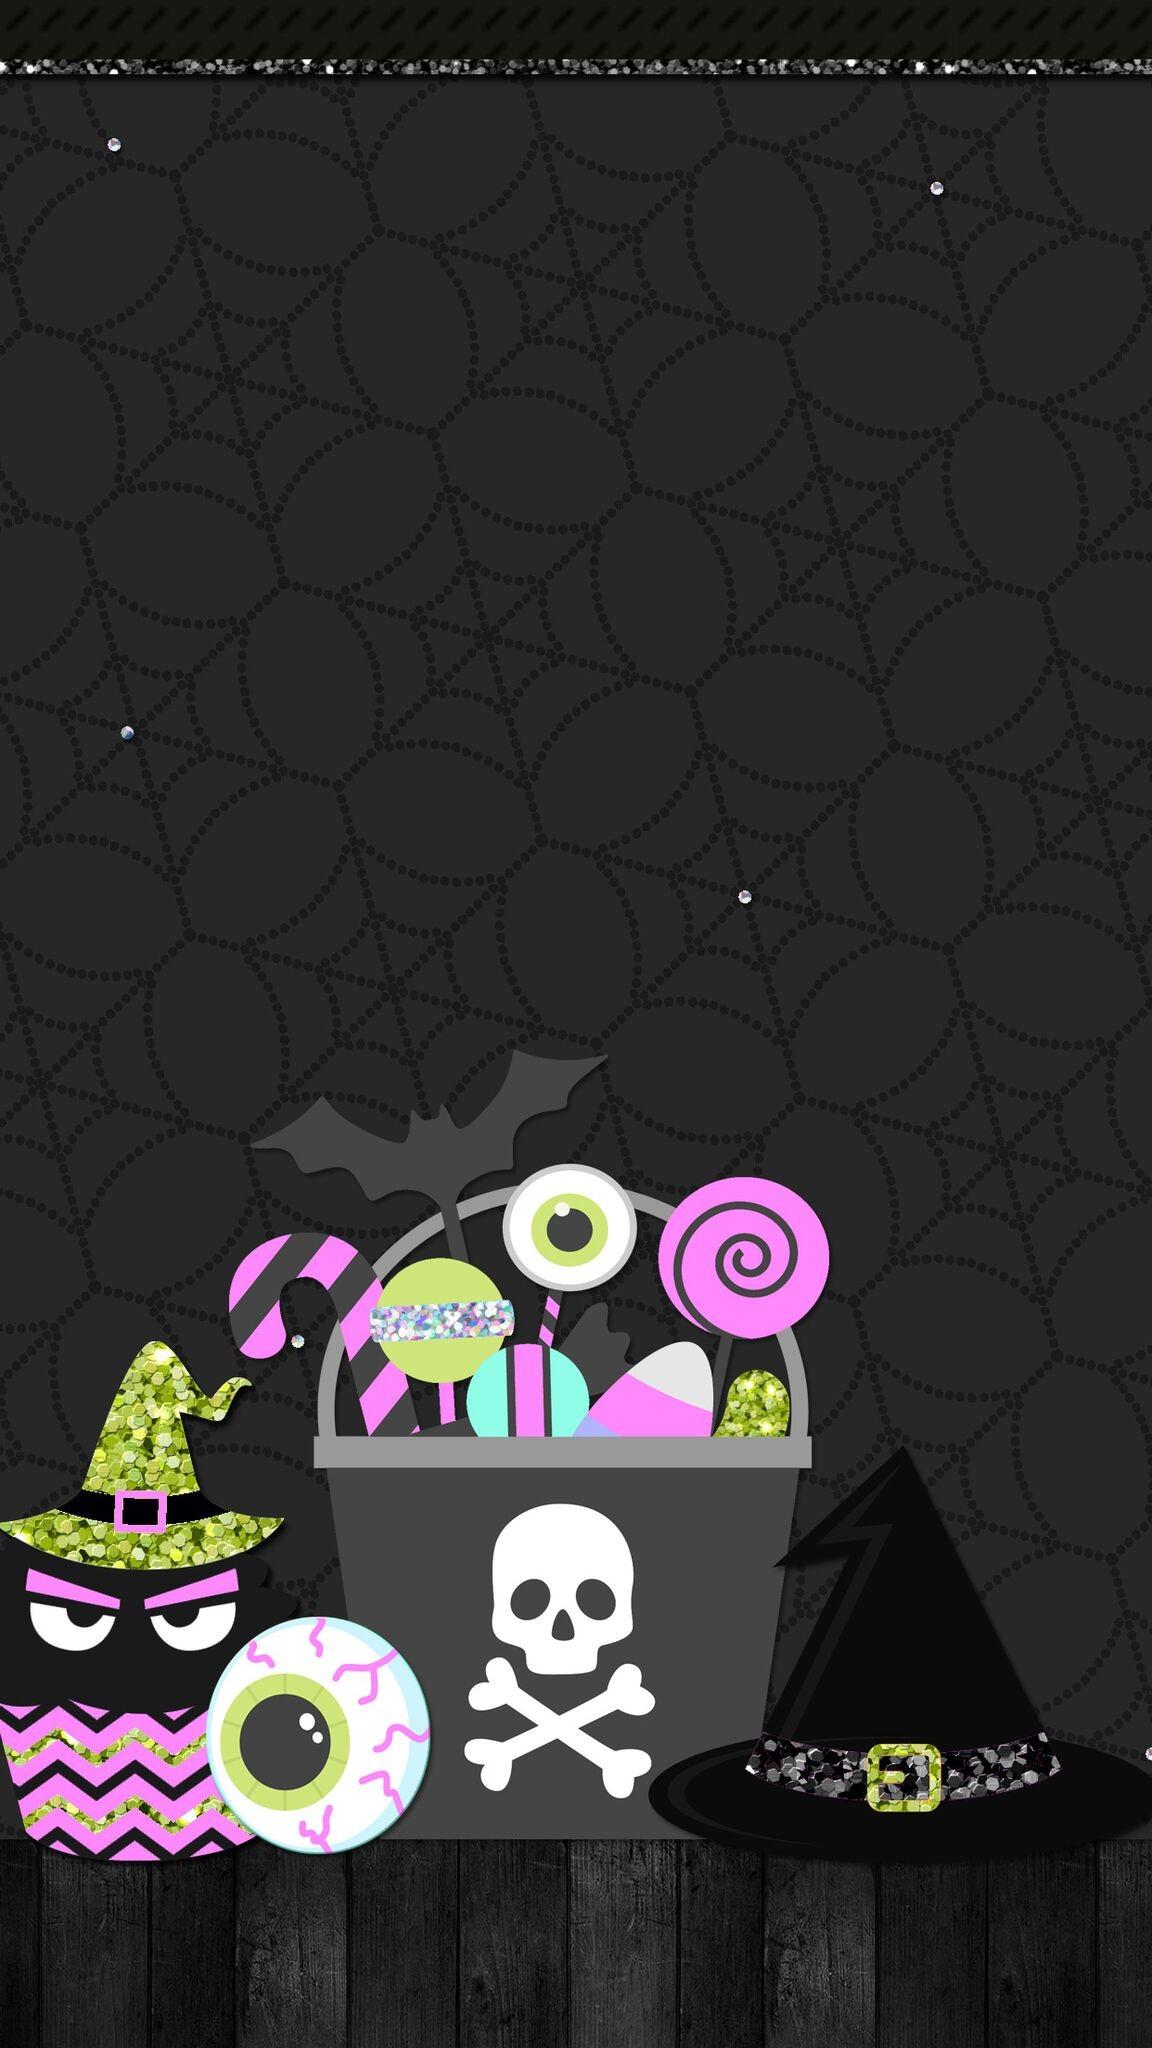 Dropbox – Creepy cute theme walls